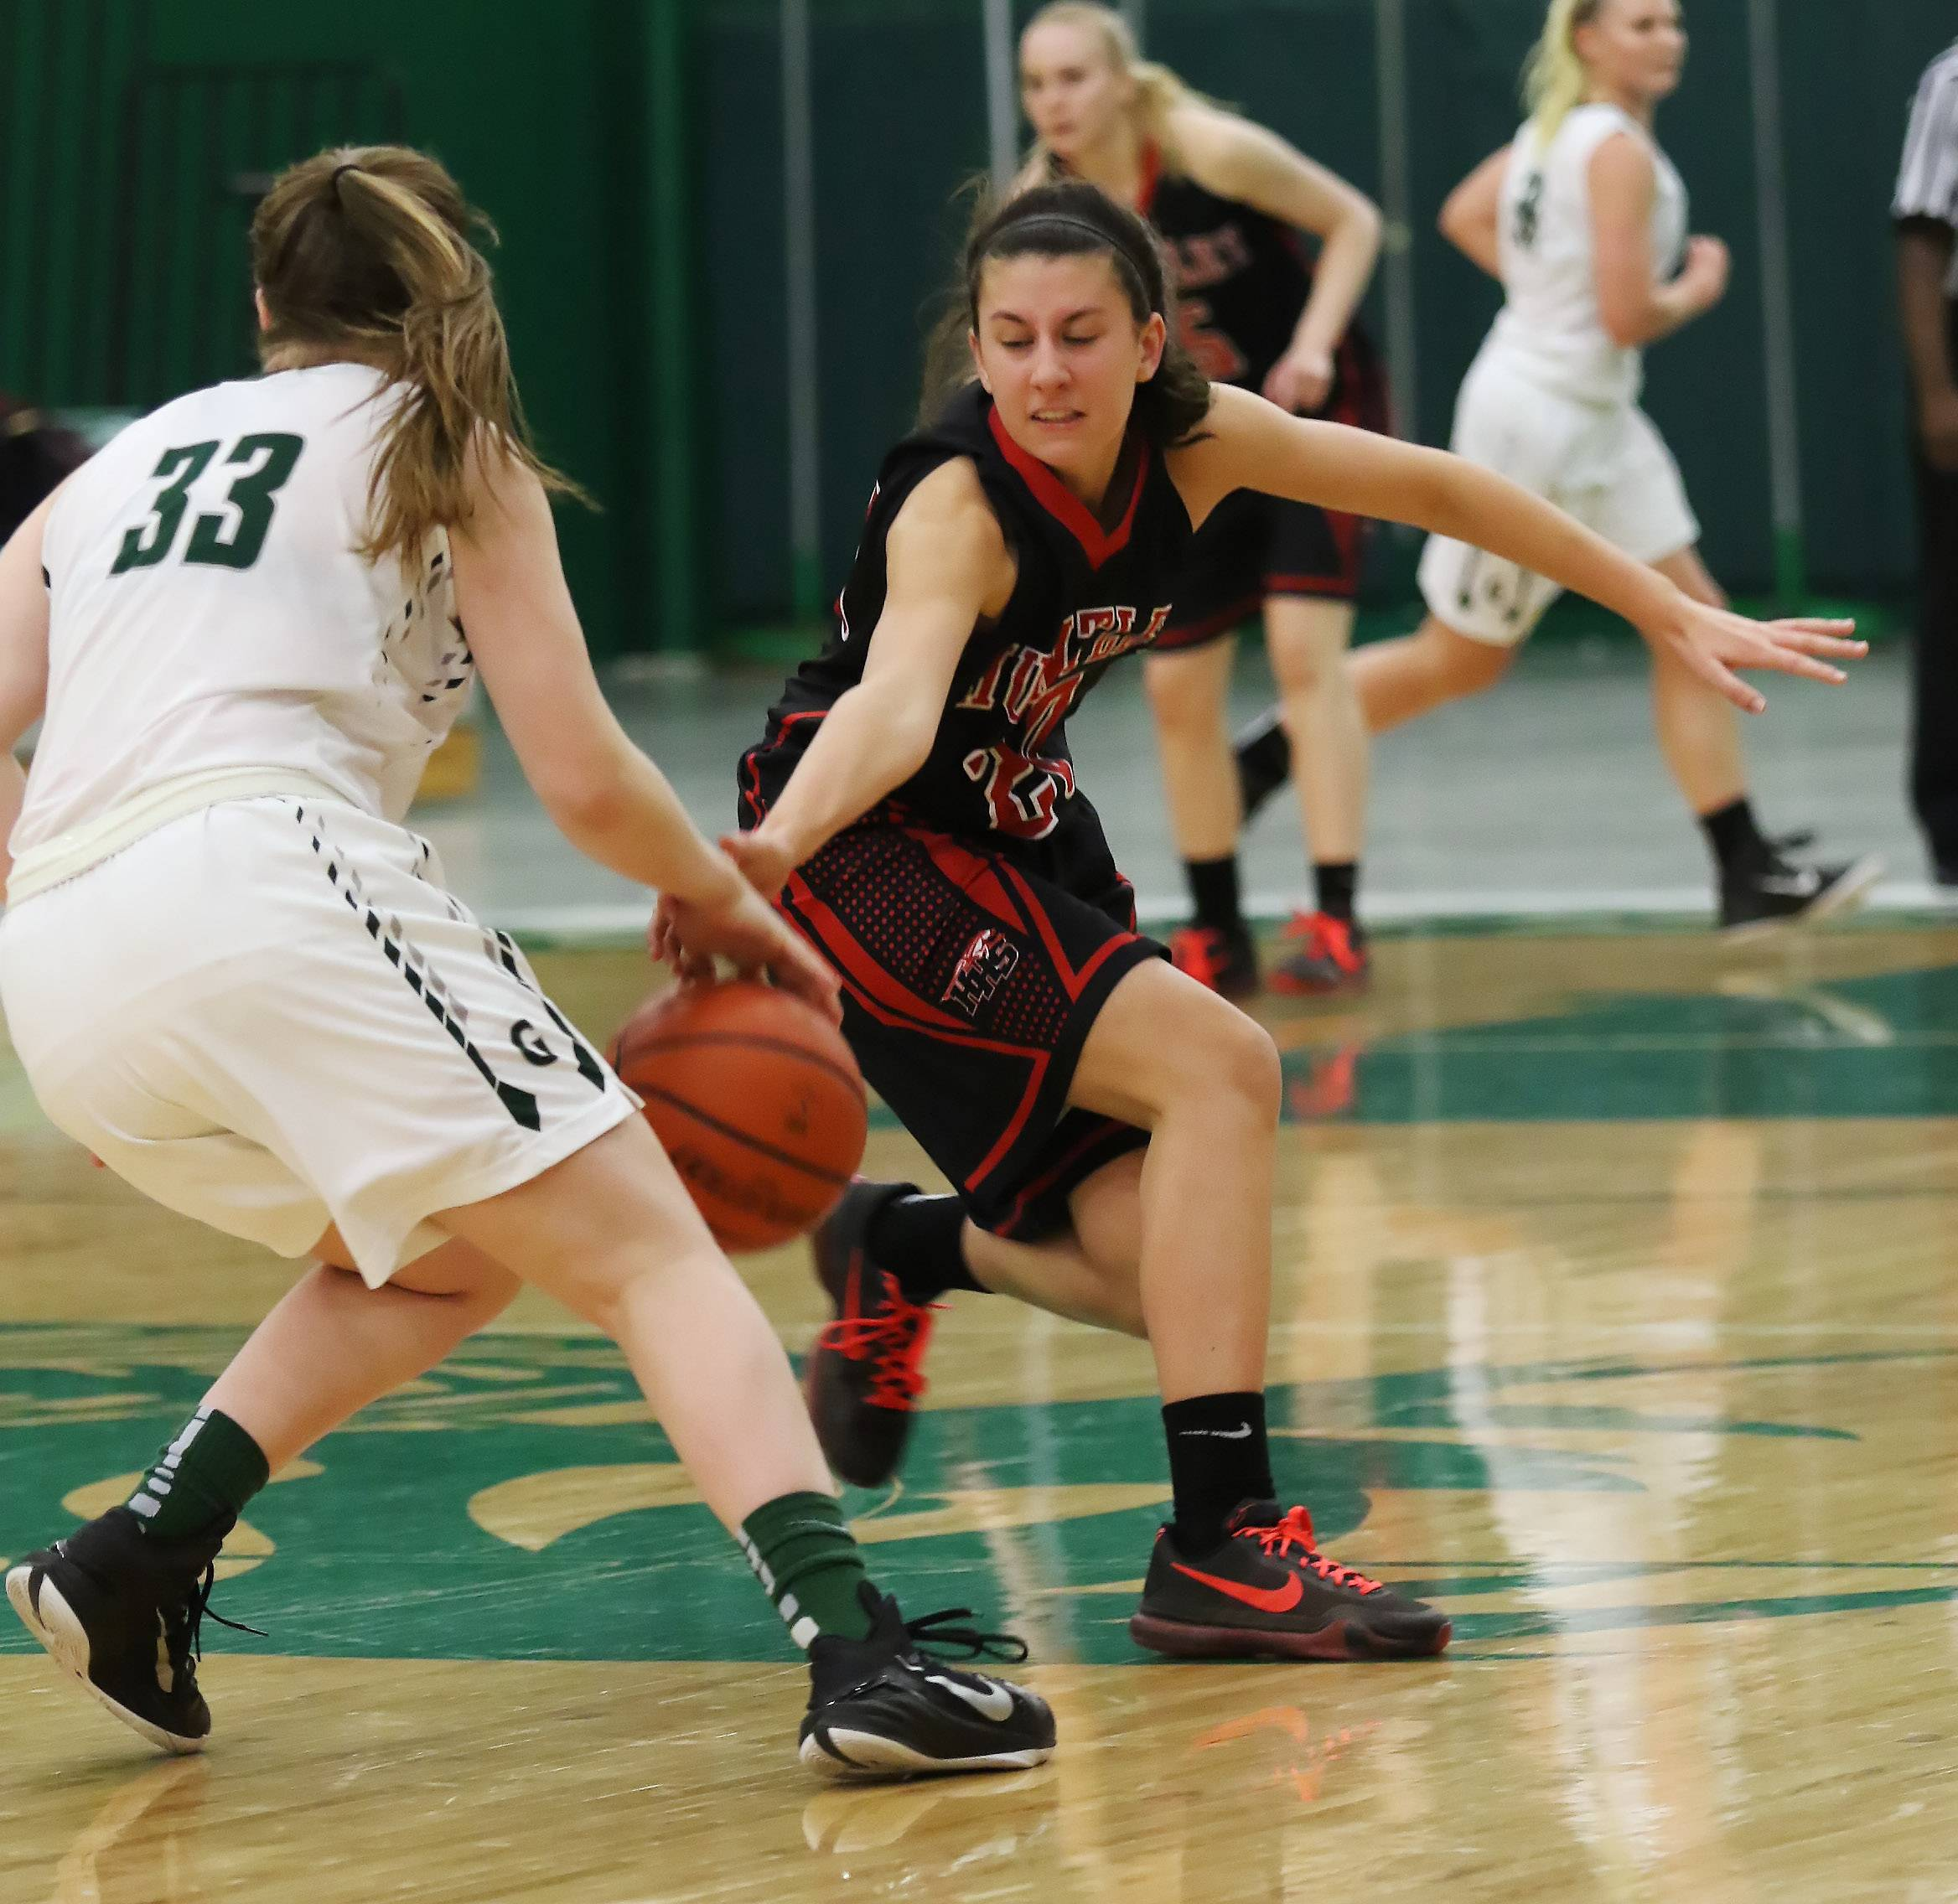 Images: Grayslake Central vs. Huntley girls basketball